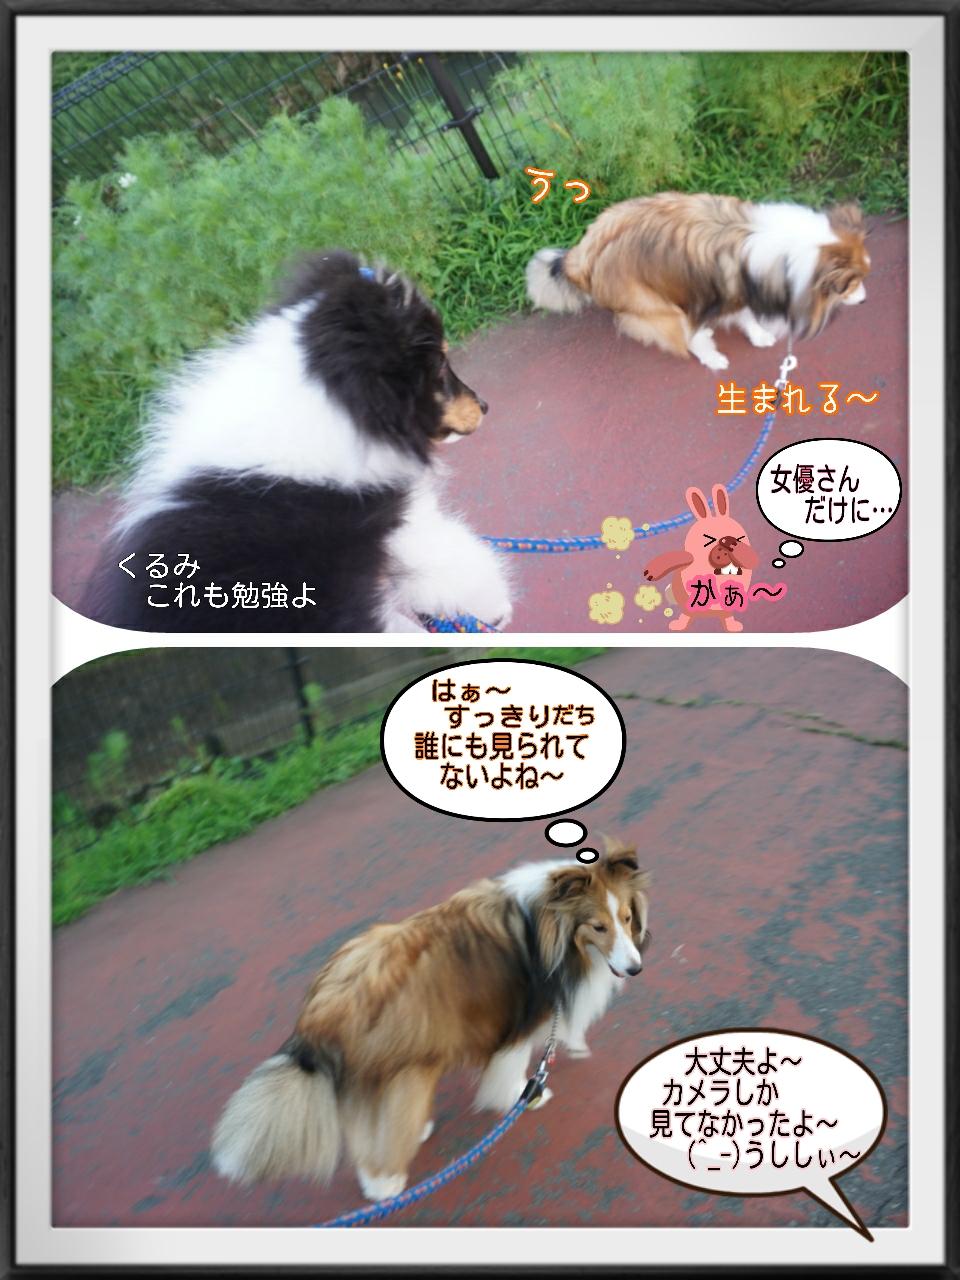 2015-07-11-03-11-03_deco.jpg